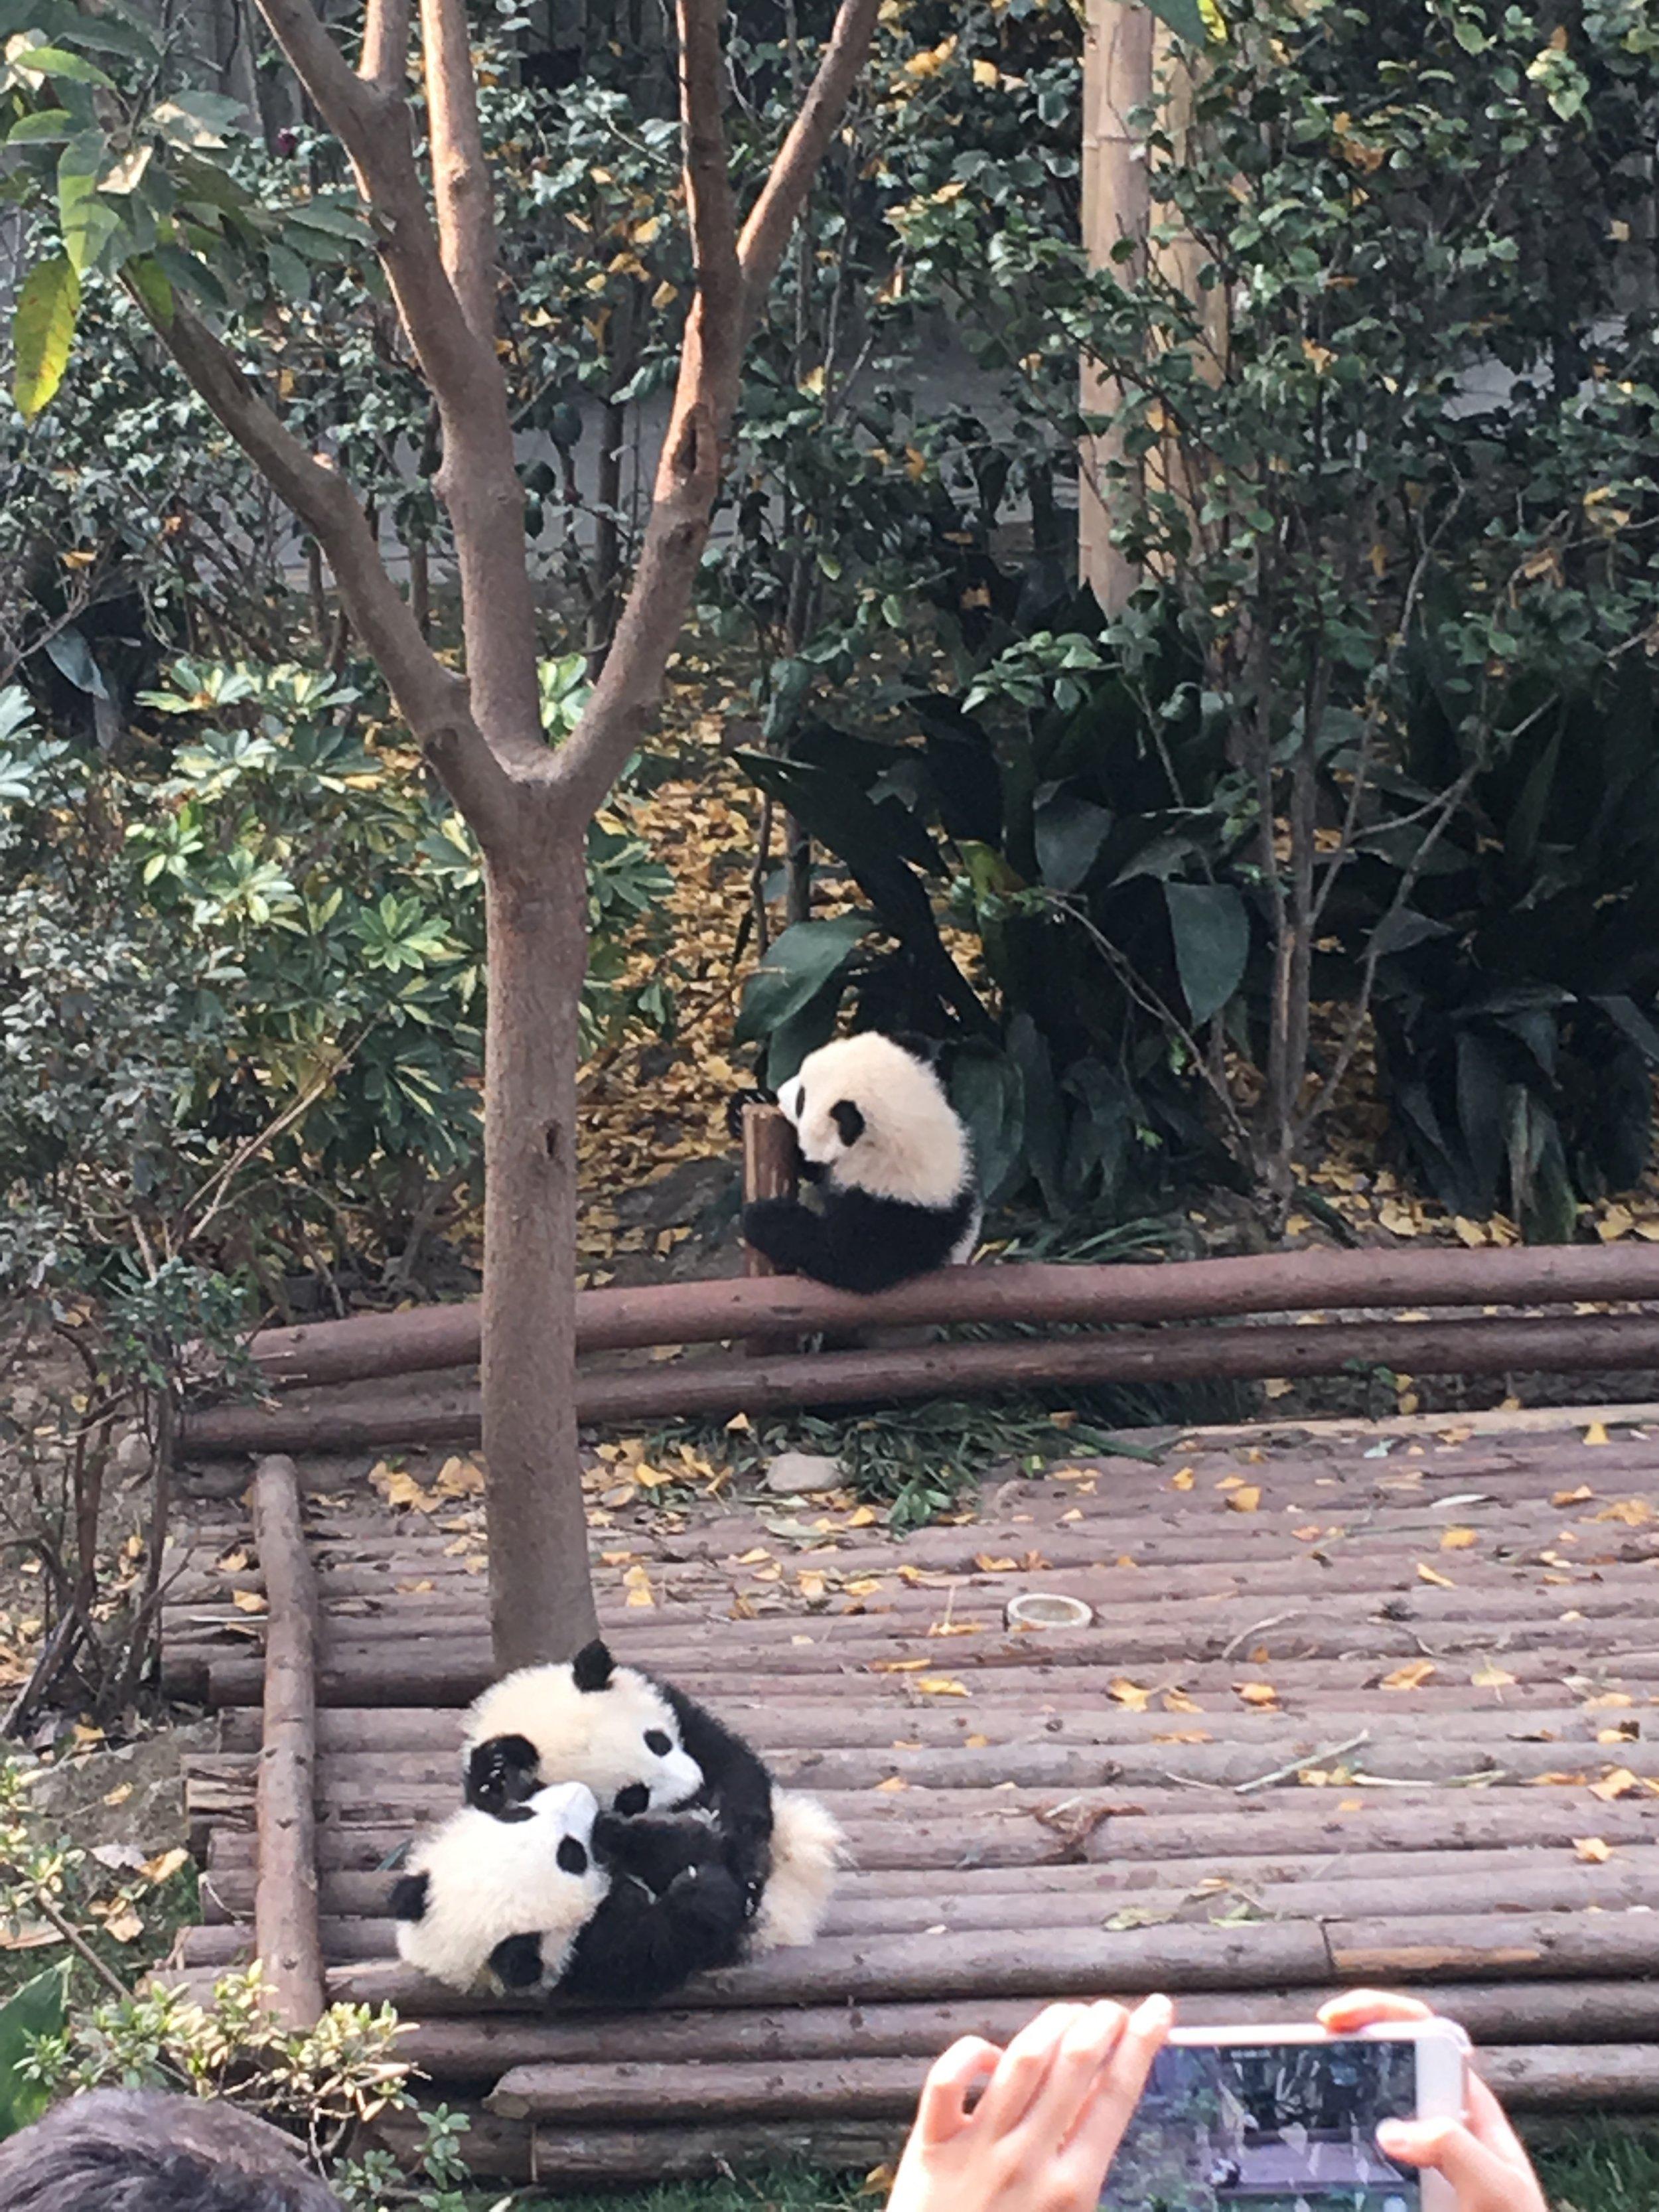 Chengdu Panda Research Center Baby Pandas